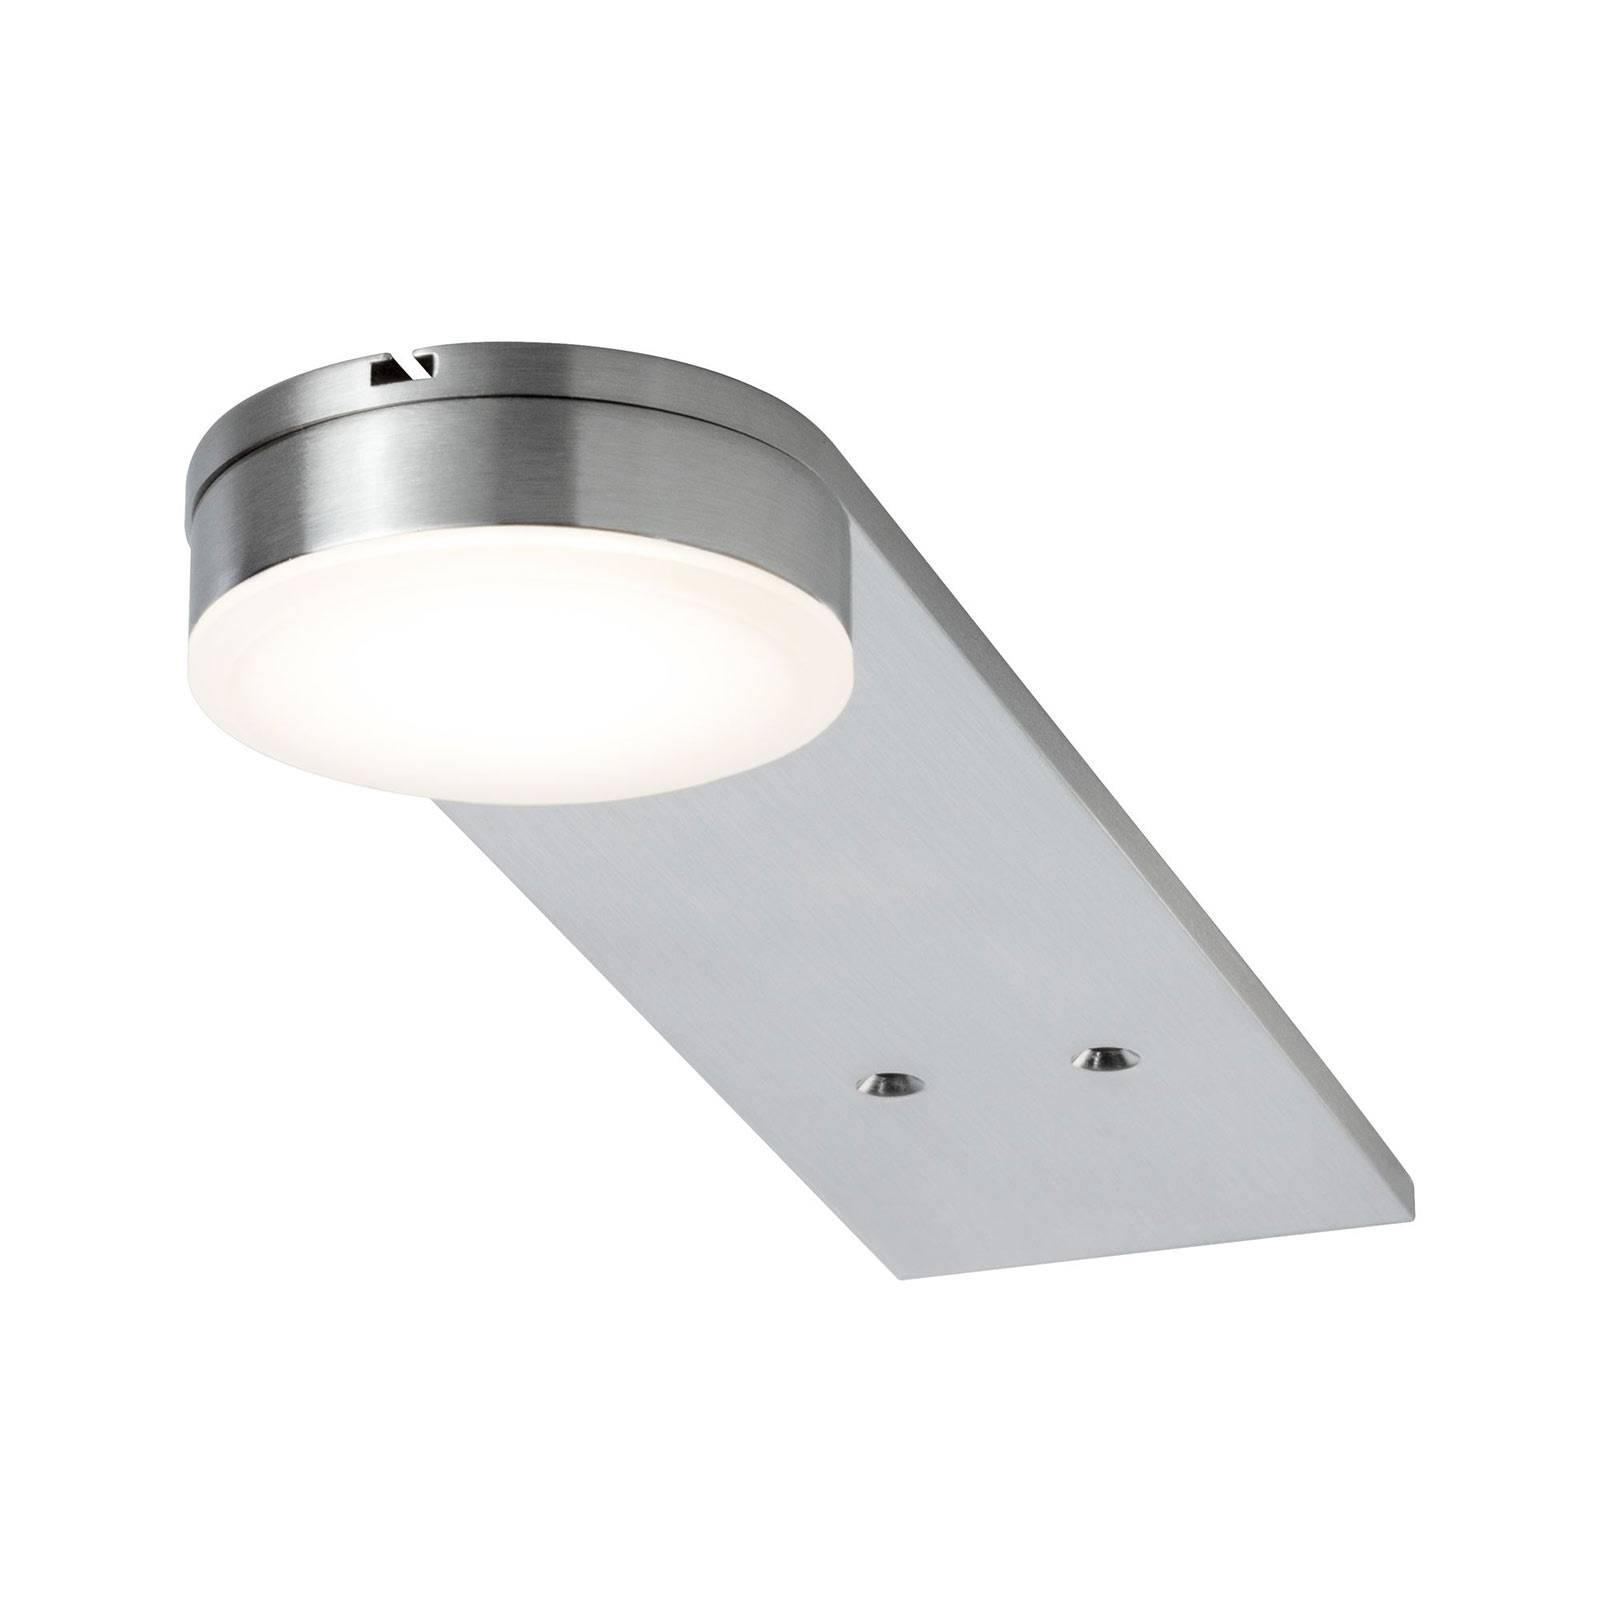 Paulmann Setup LED-kalustevalaisin 3 kpl pyöreä